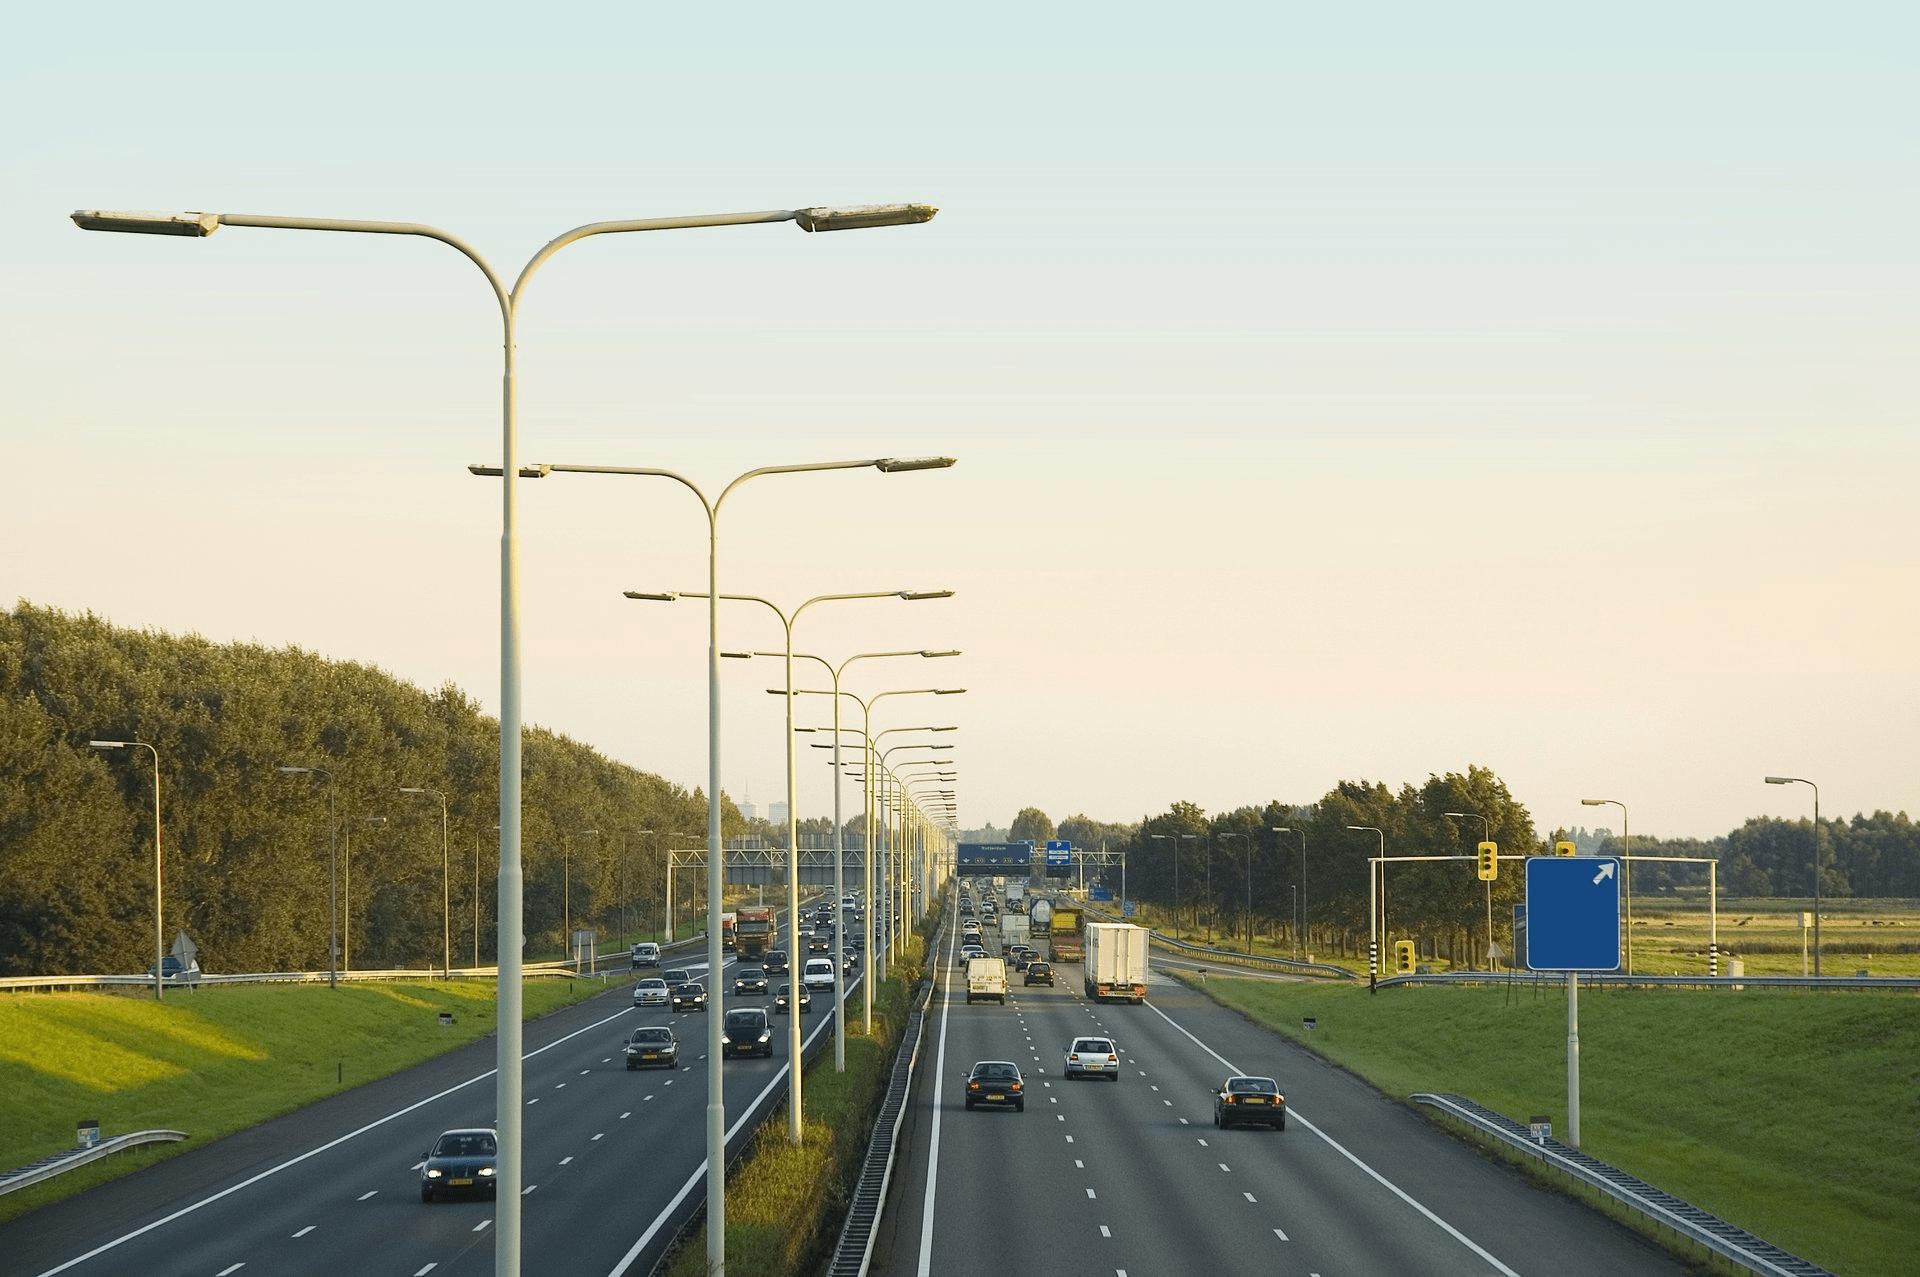 Mobile navigation image